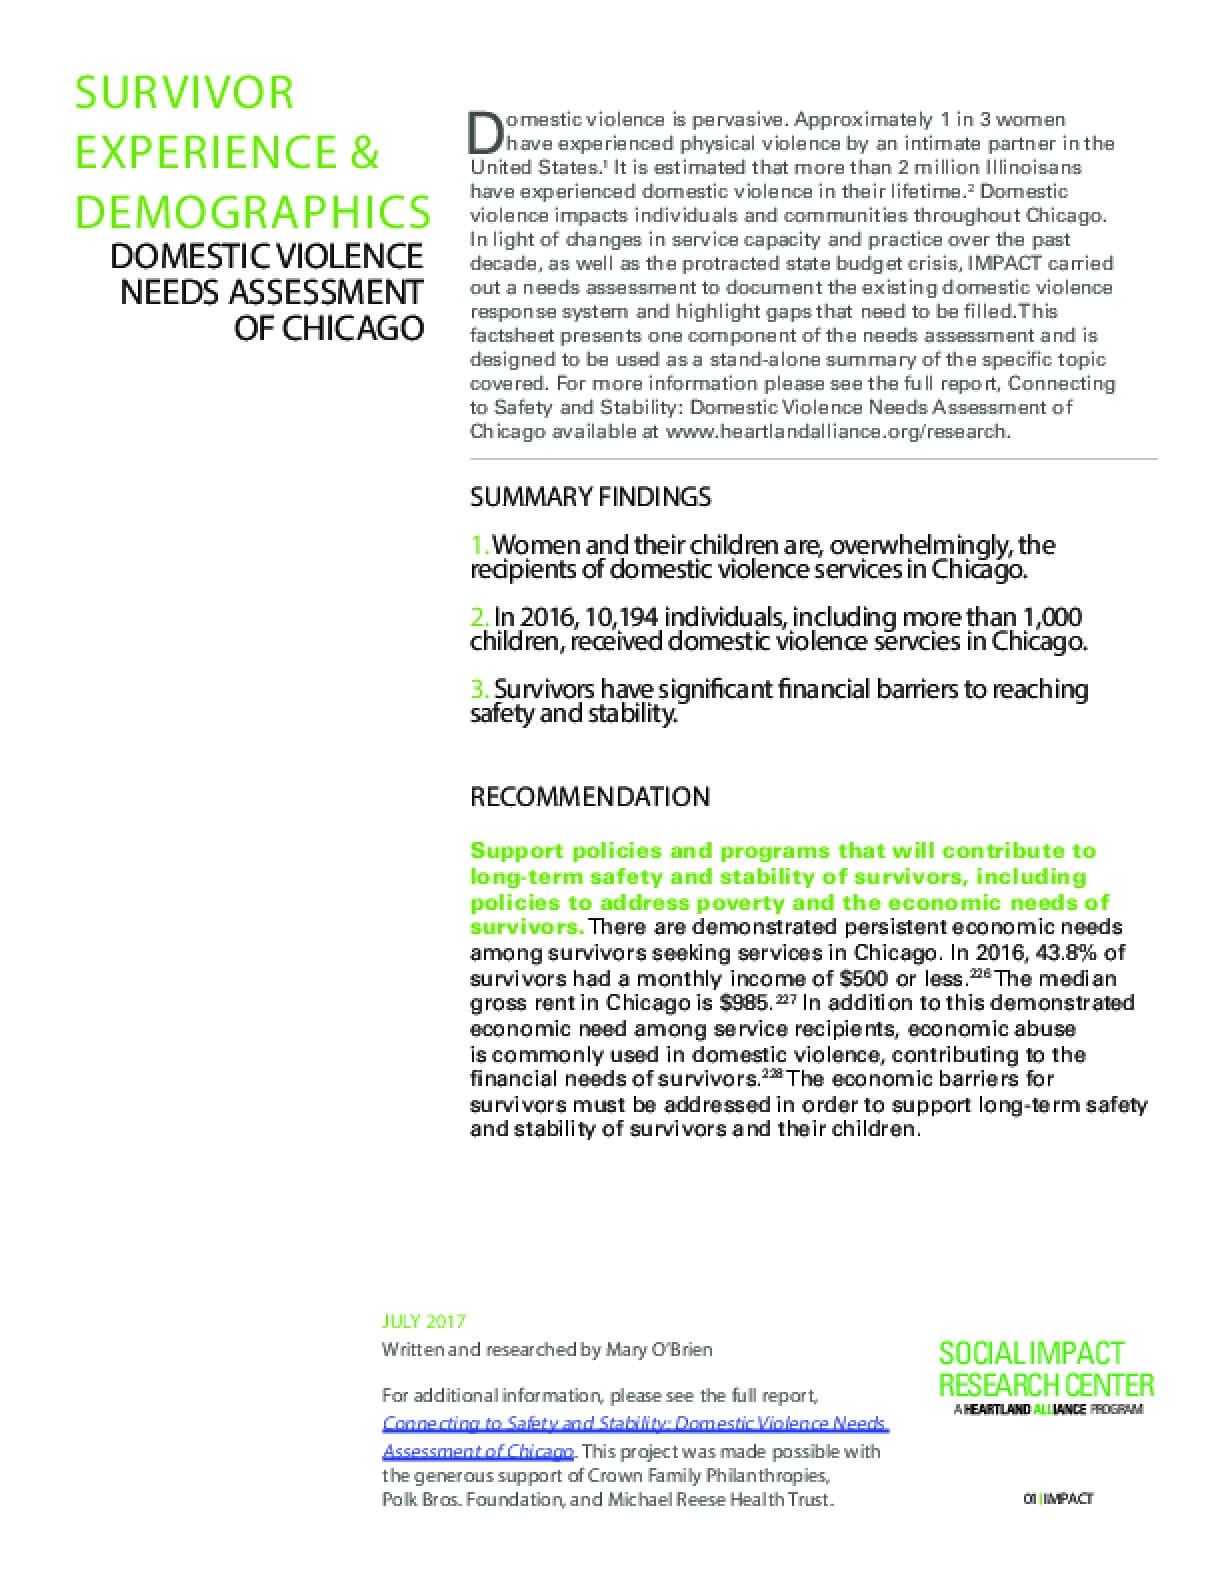 FactSheet: Survivor Demographics (DV Landscape)